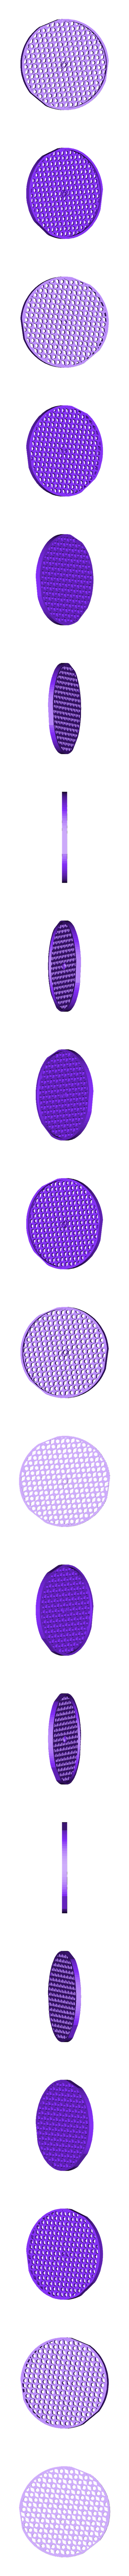 Rejilla_0.stl Download free STL file #3DvsCOVID19 Mask filters with side breathing • 3D printer object, alonsothander